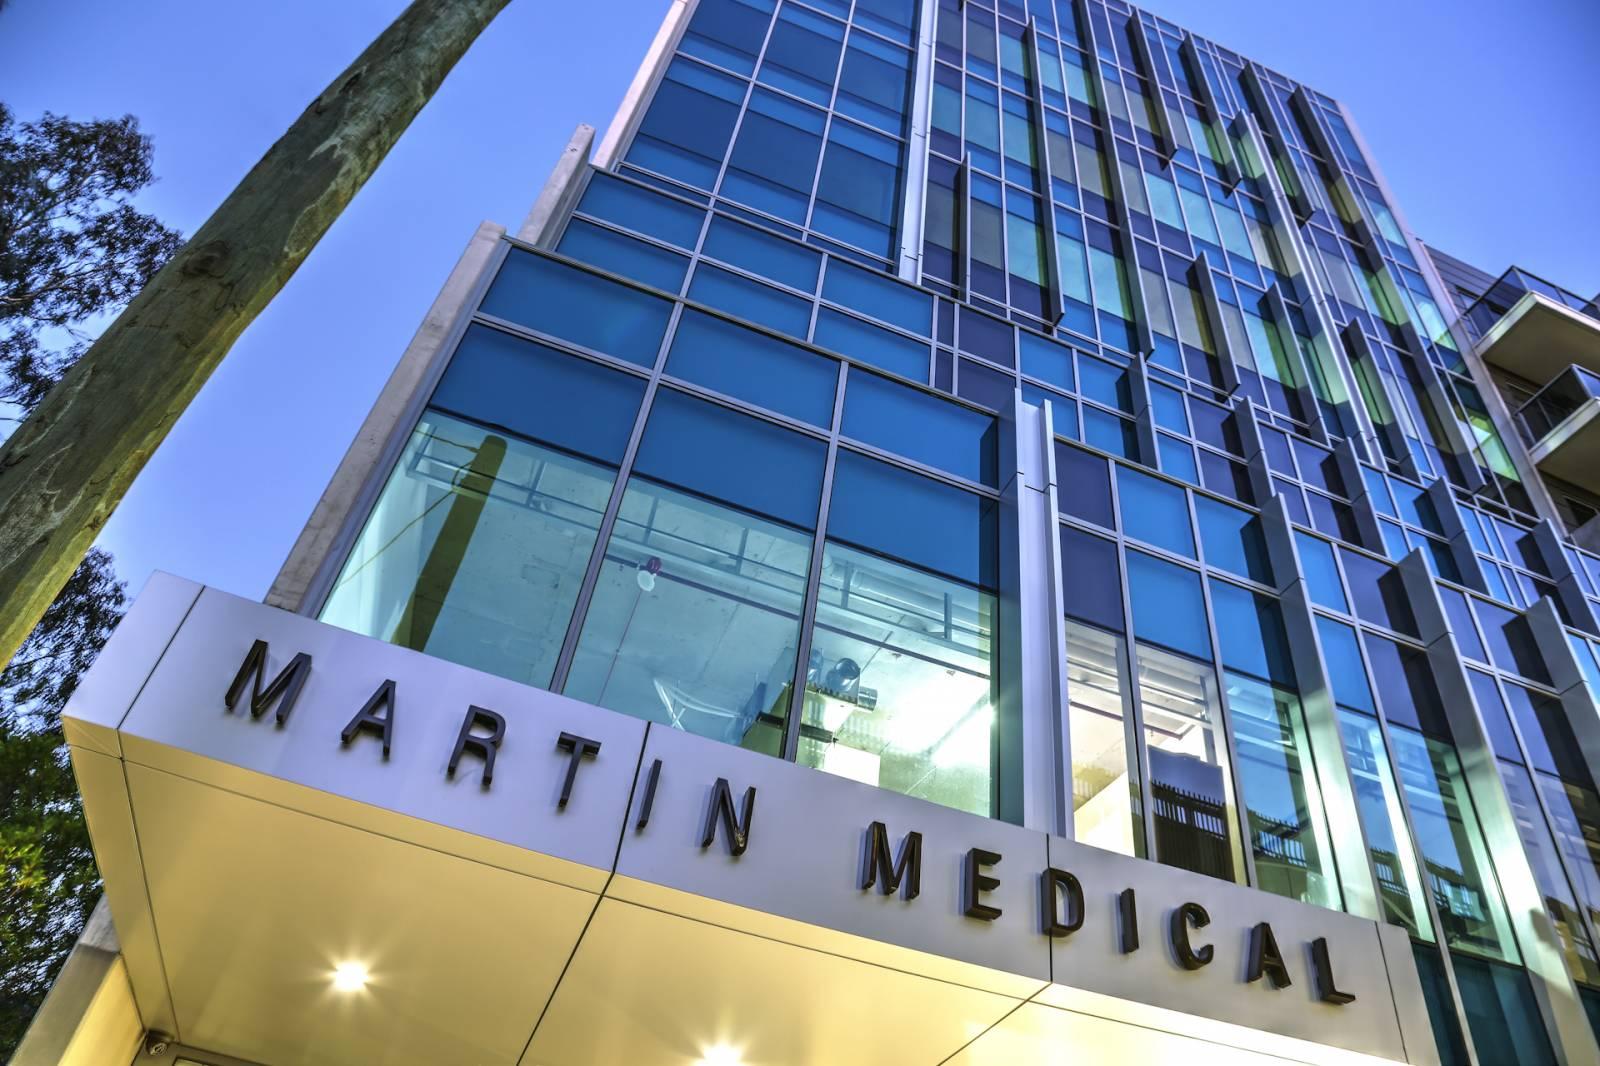 Martin Medical